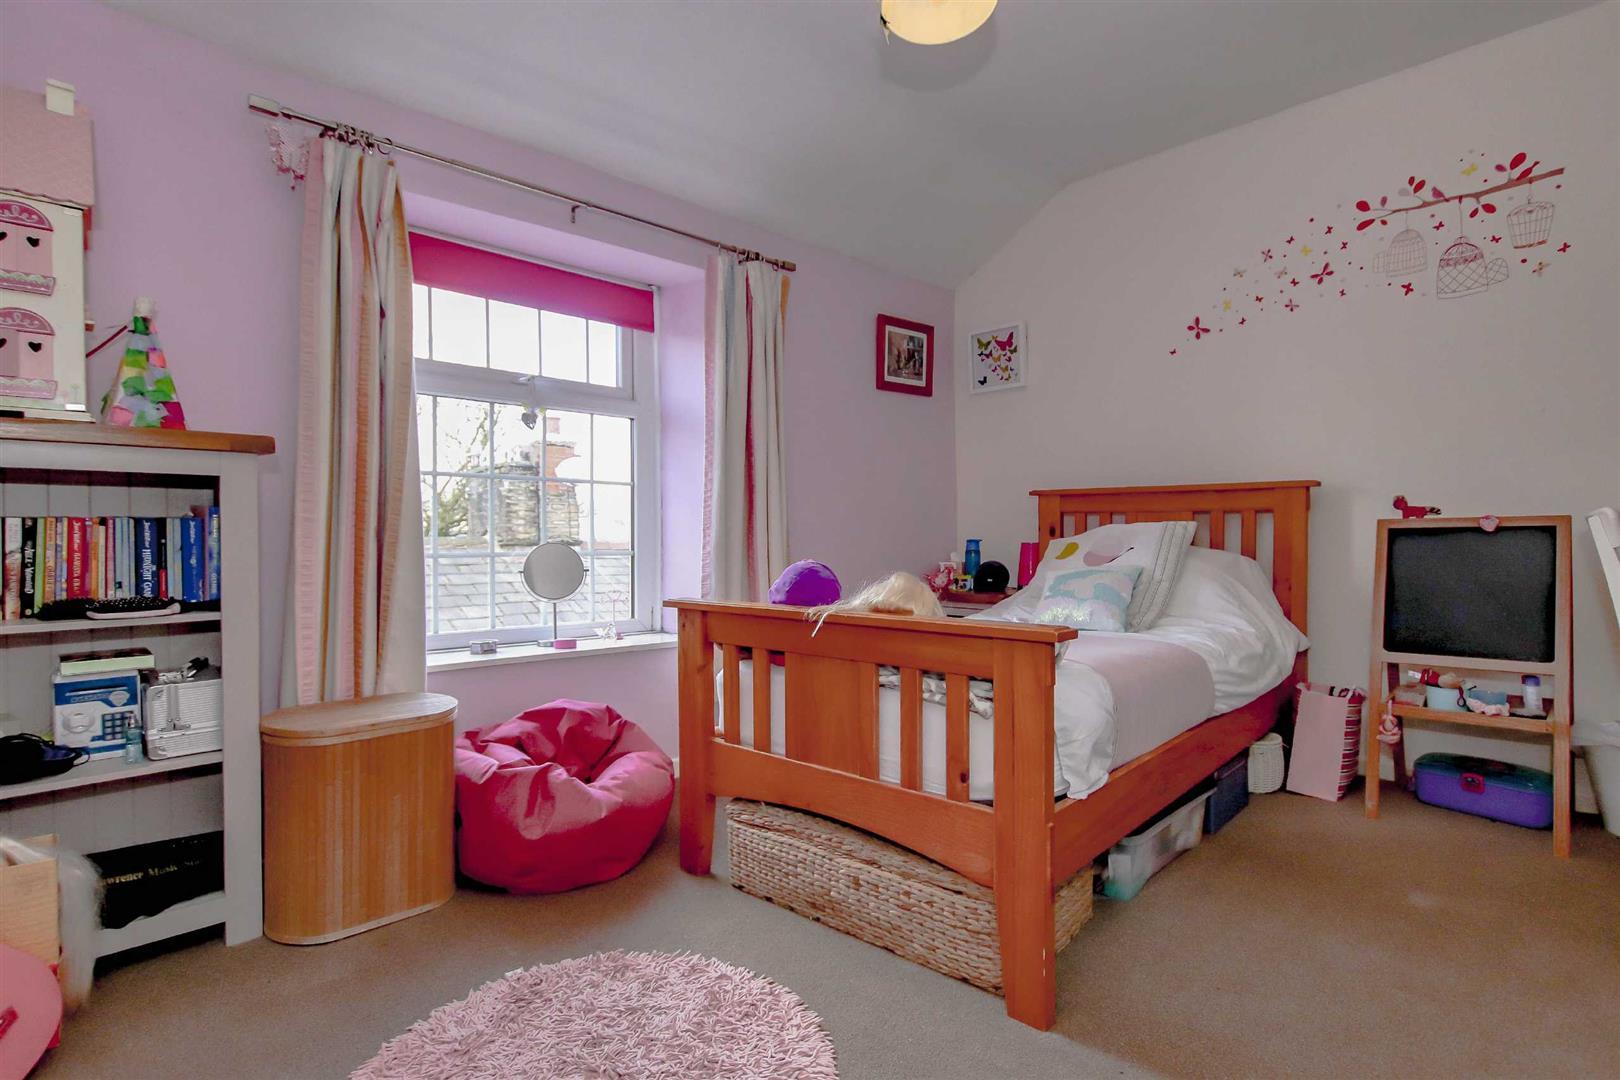 4 Bedroom Detached House For Sale - p033686_09.jpg